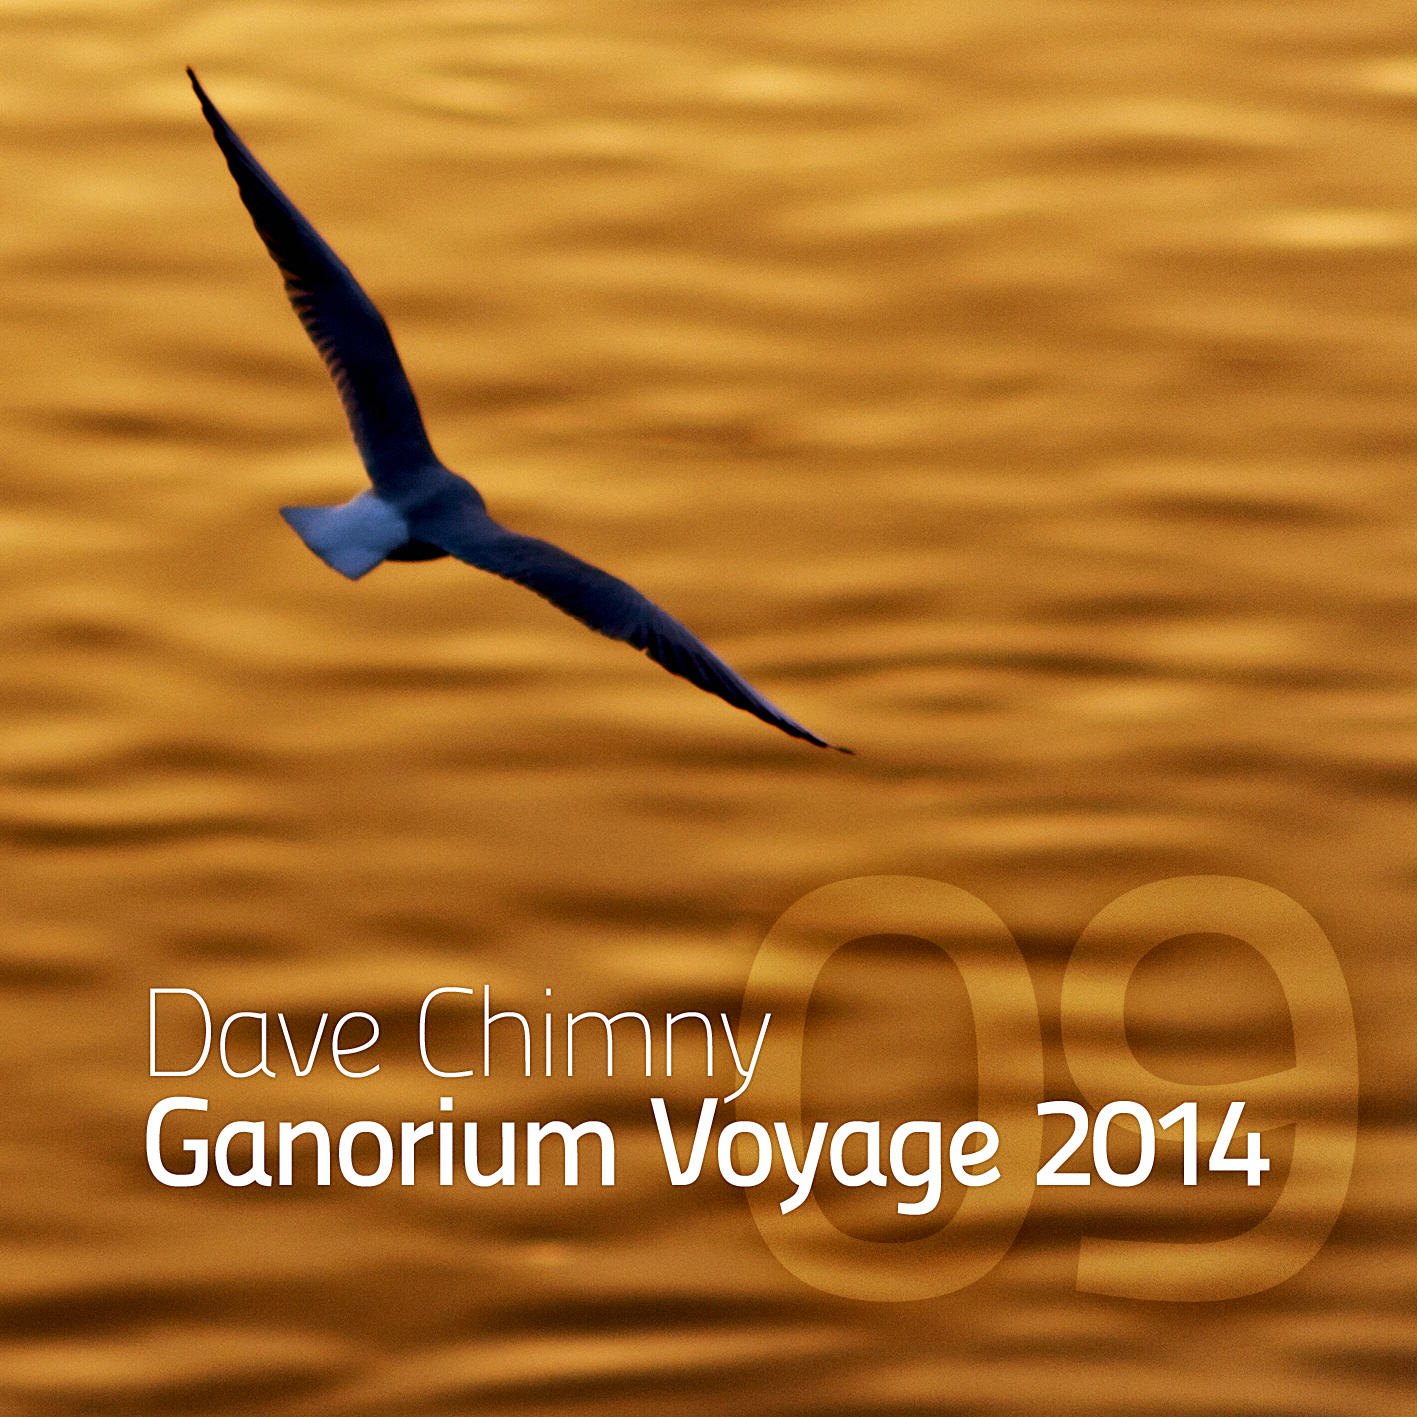 2014 09  >> Dave Chimny Ganorium Voyage 2014 09